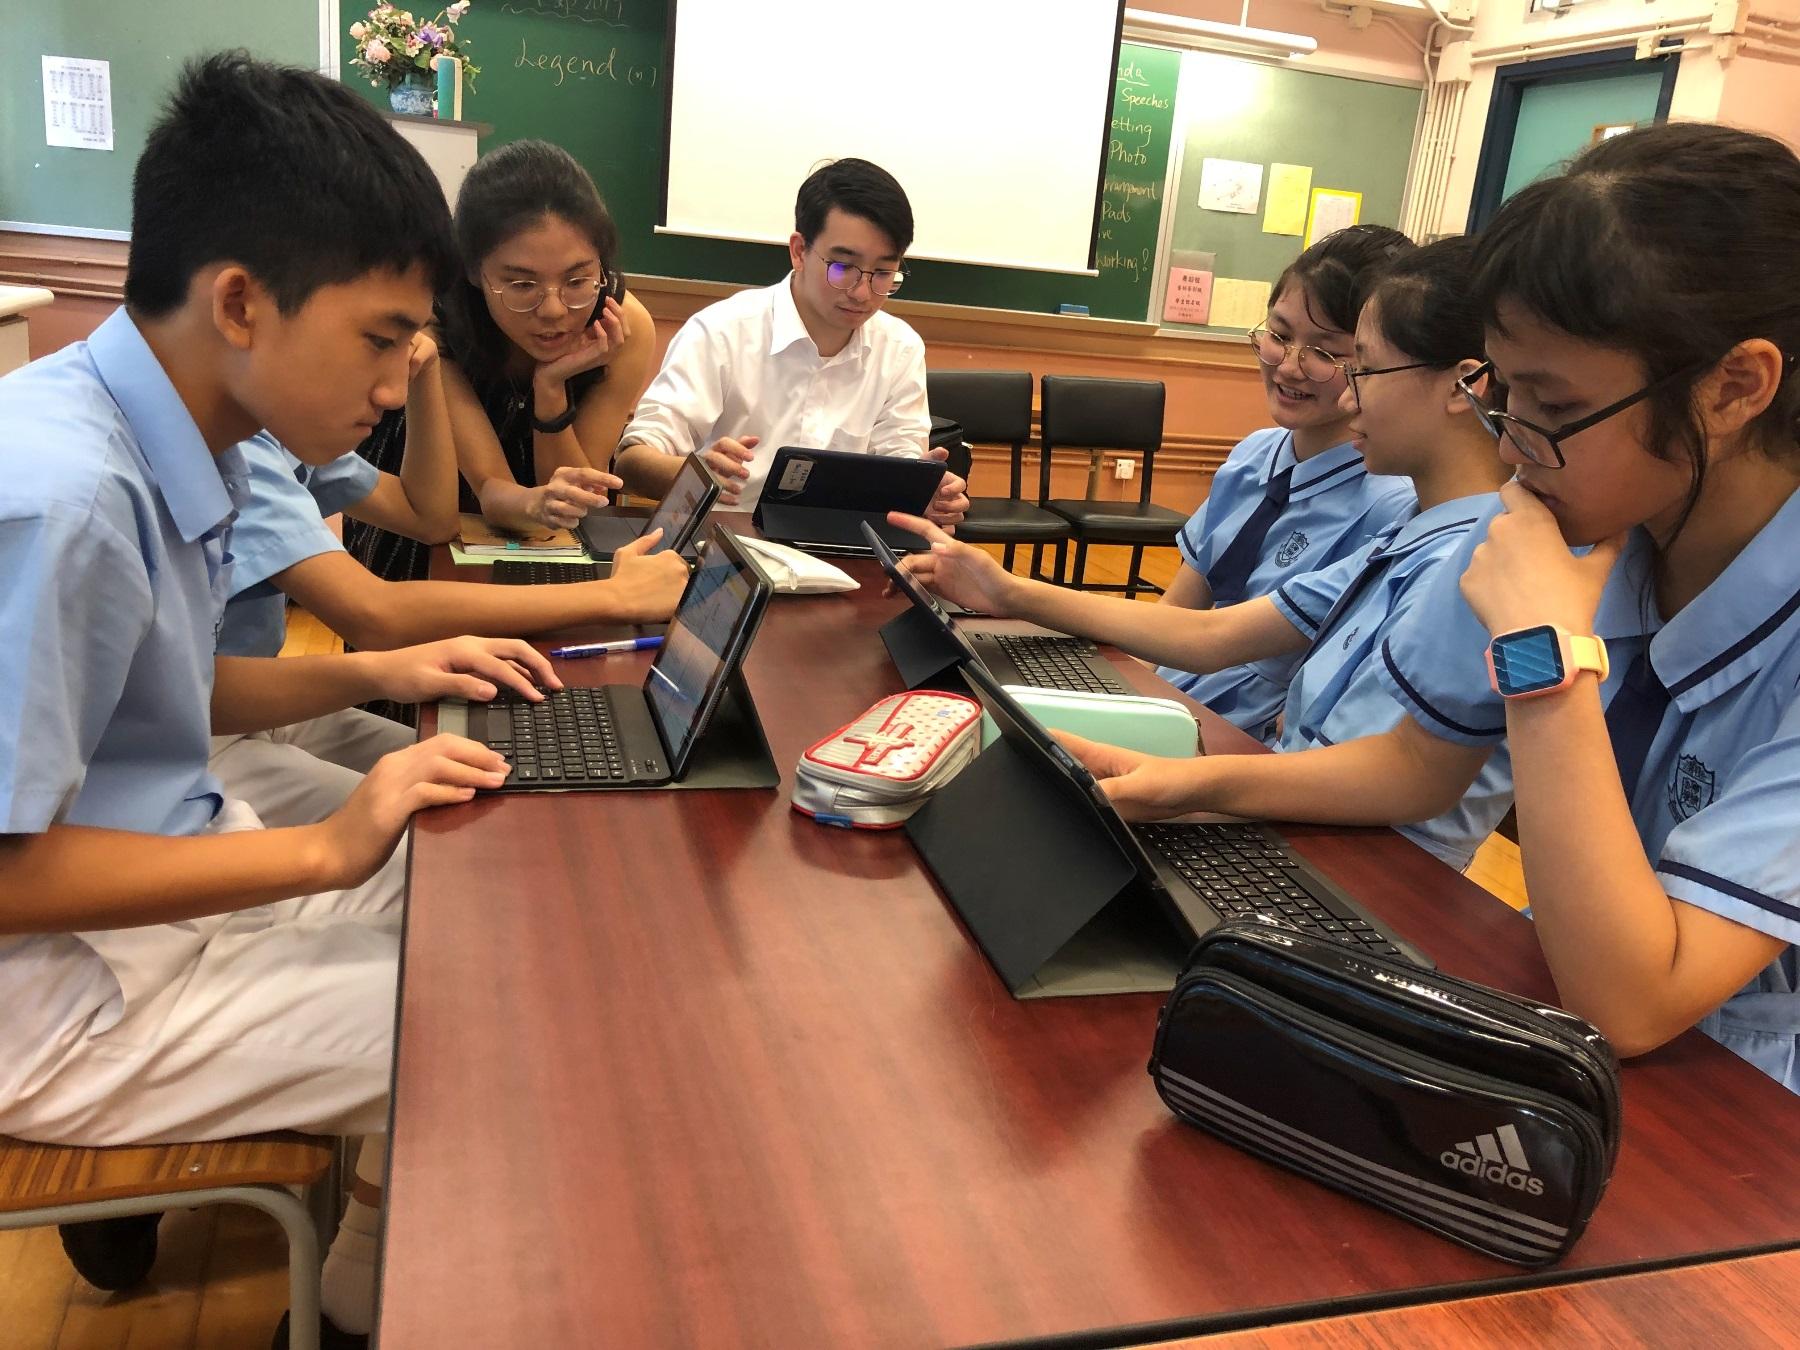 https://www.npc.edu.hk/sites/default/files/img_4594.jpg